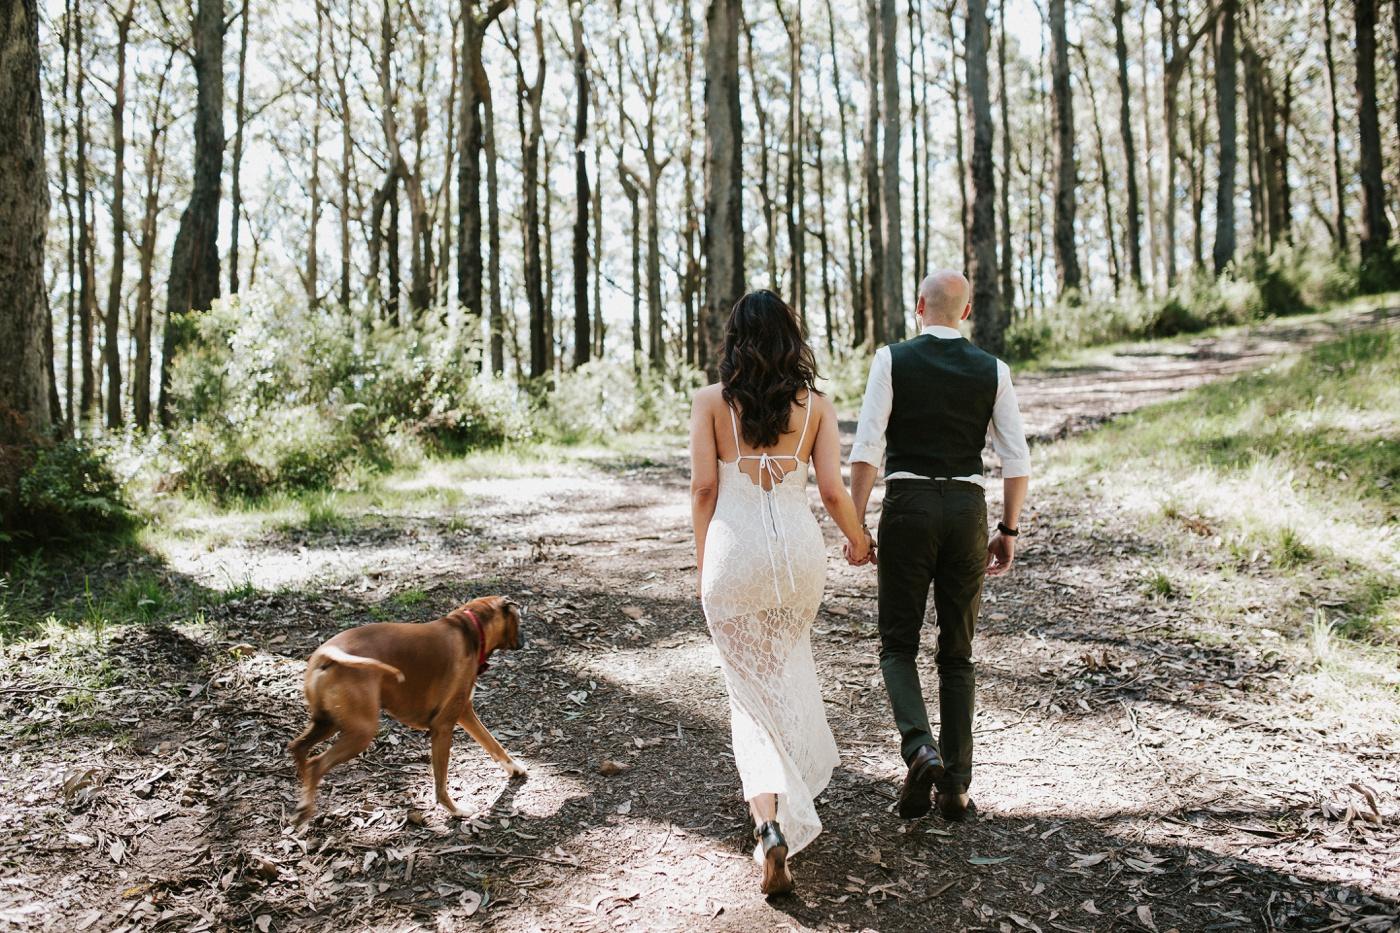 monicajames_dandenongs-dog-fun-relaxed-engagement-shoot_melbourne-fun-candid-wedding-photography_11